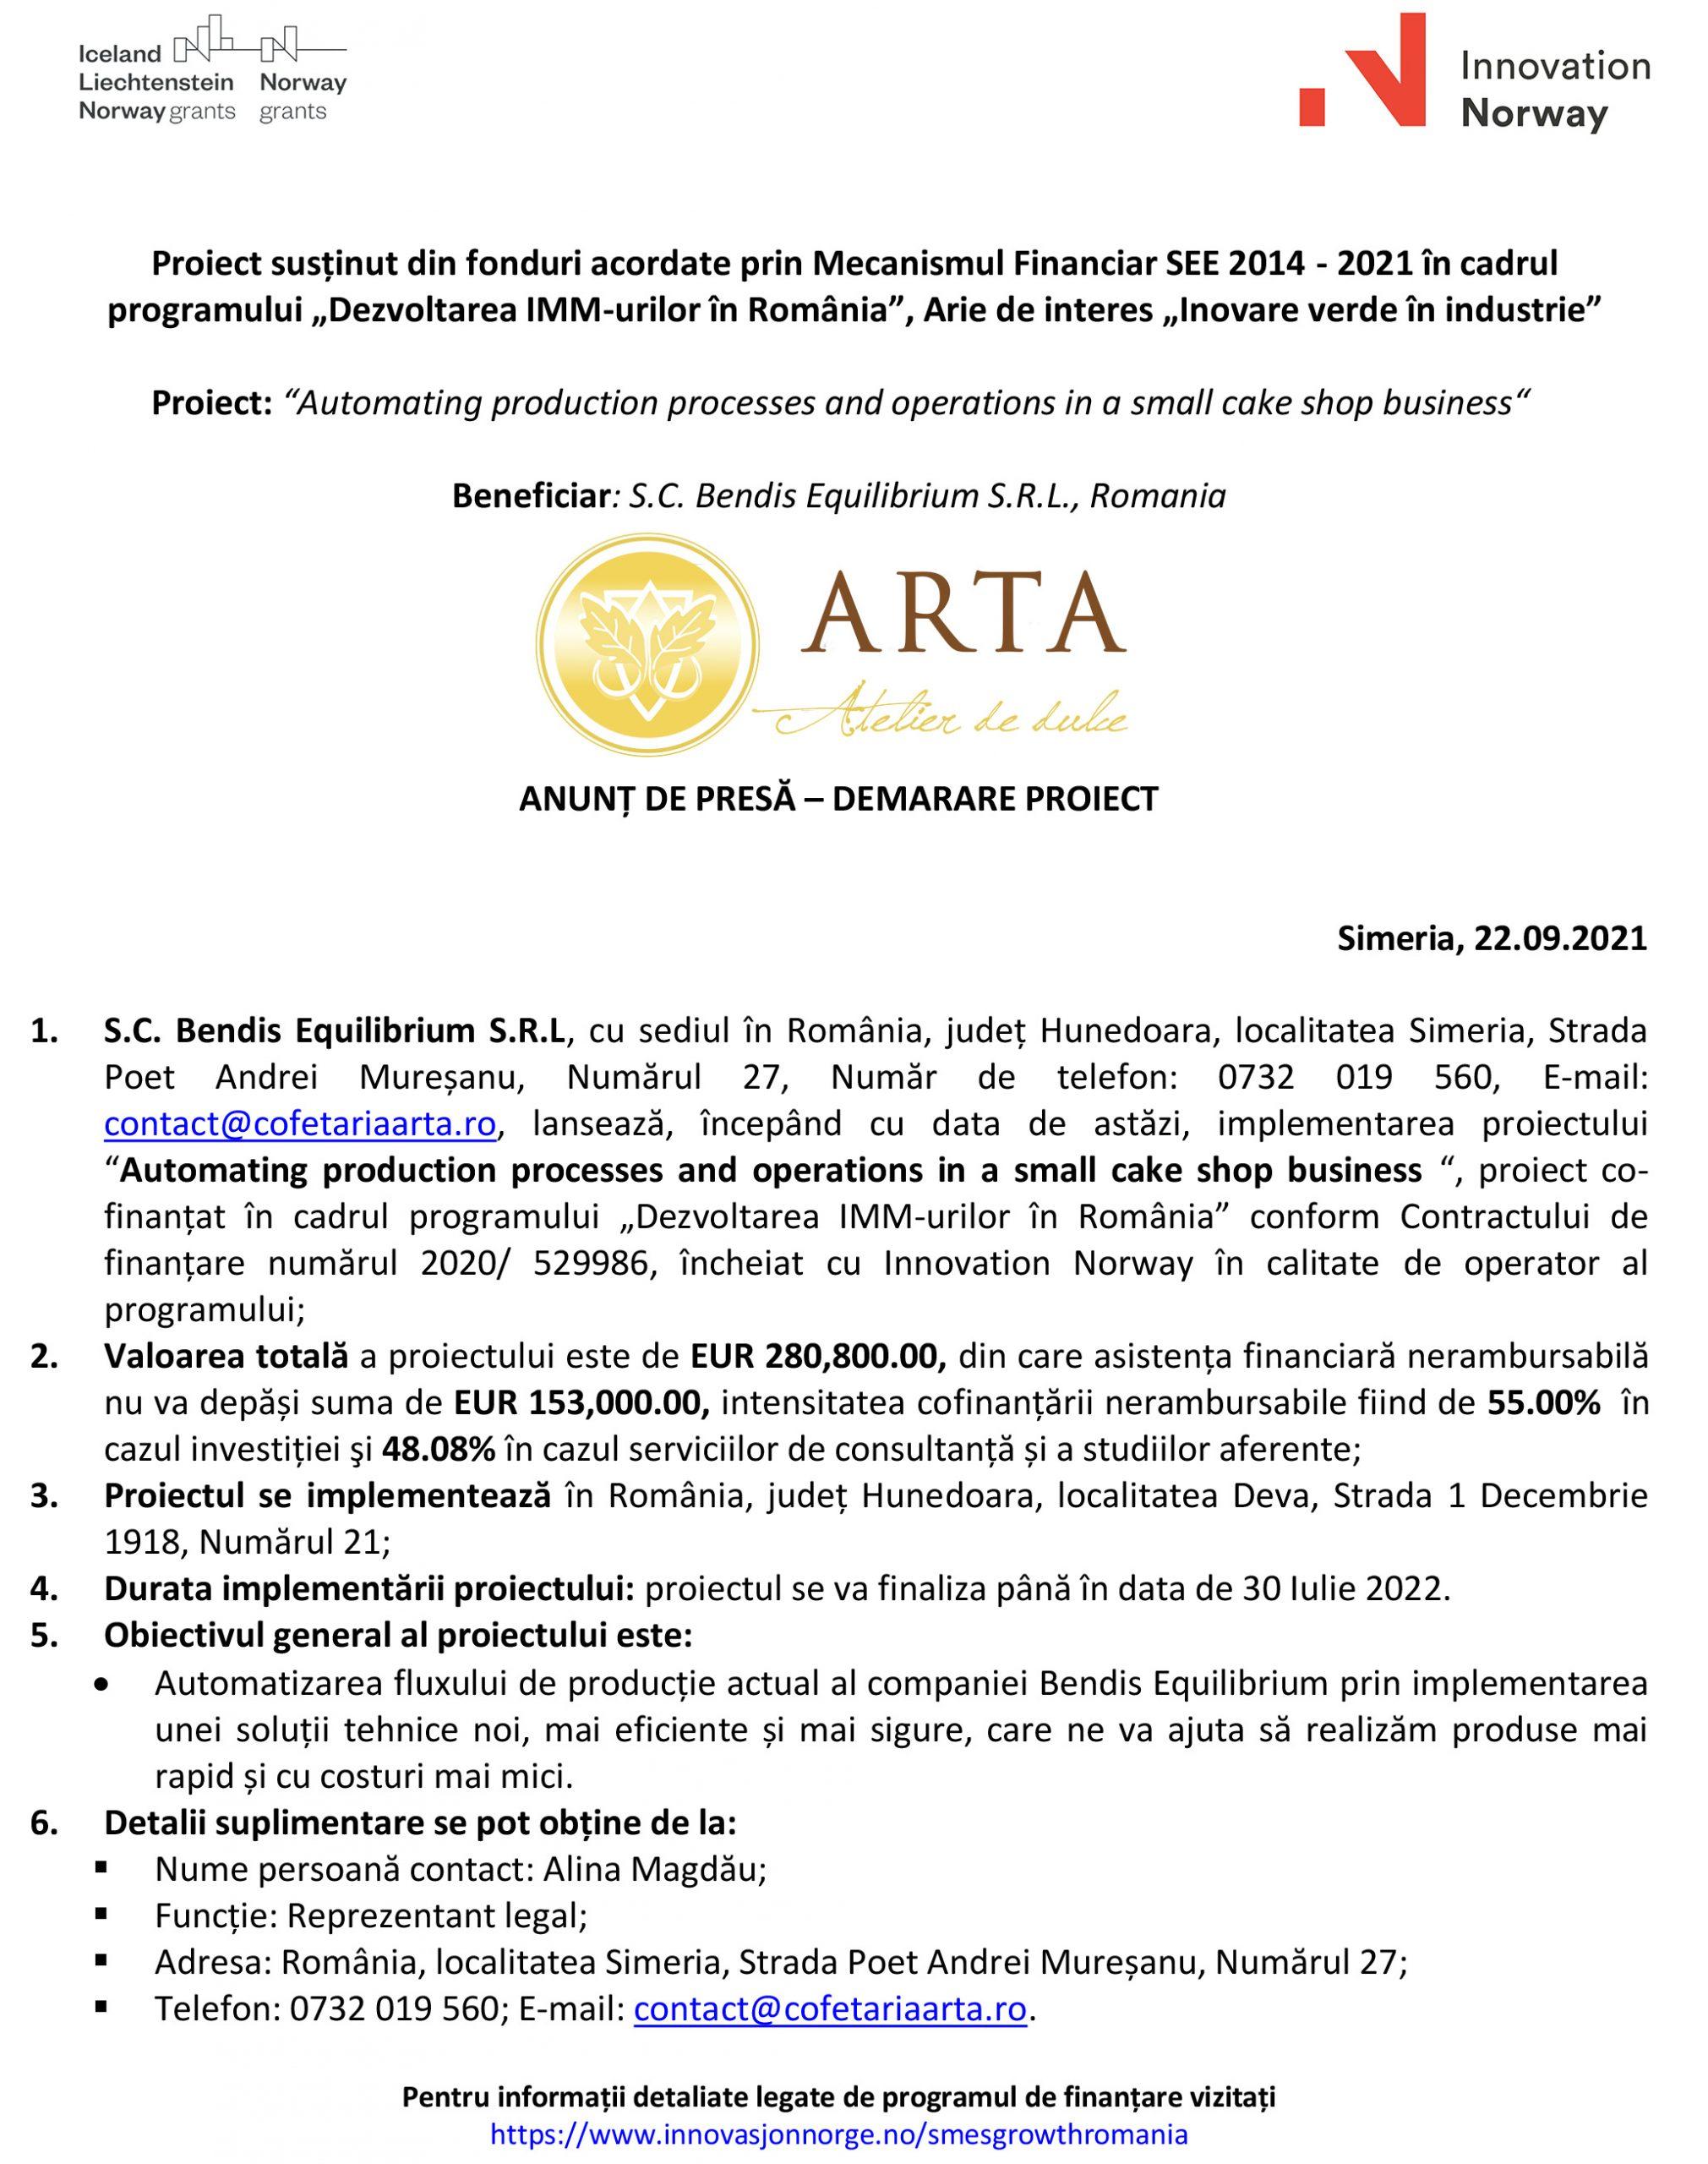 ANUNȚ DE PRESĂ – DEMARARE PROIECT S.C. Bendis Equilibrium S.R.L